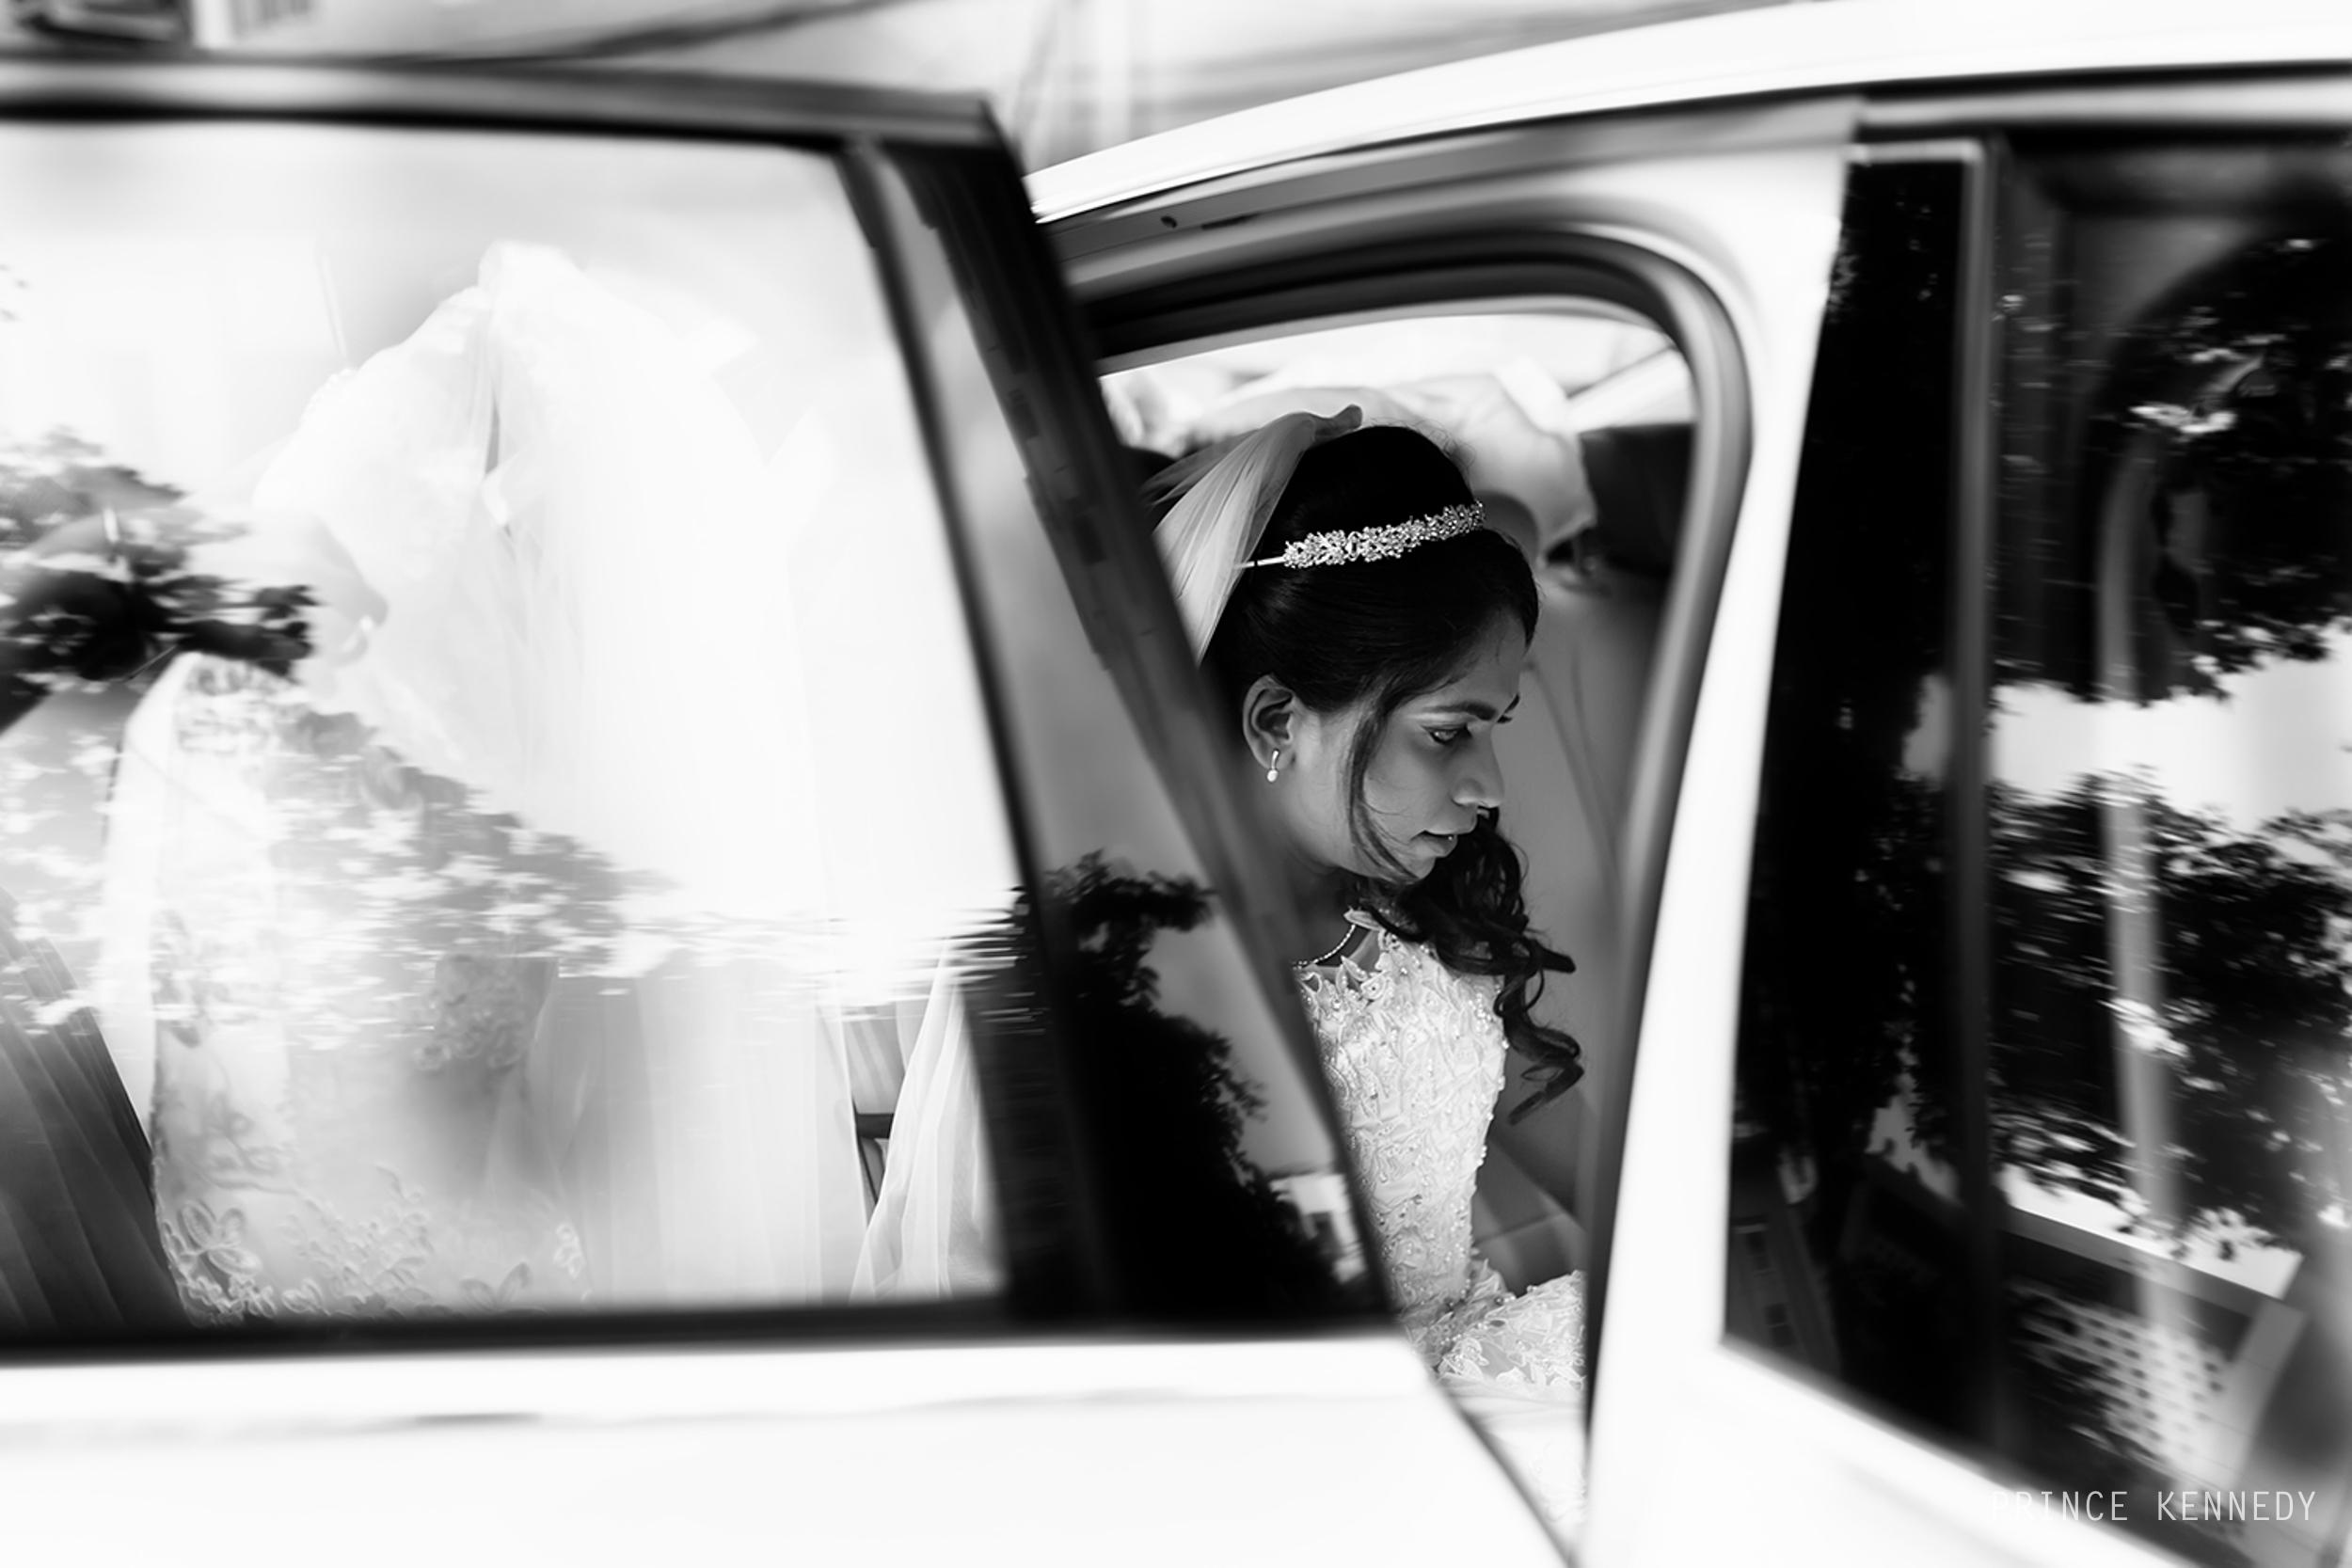 Wedding-weddings-candid-photography-chennai-photographer-best-photography9.jpg